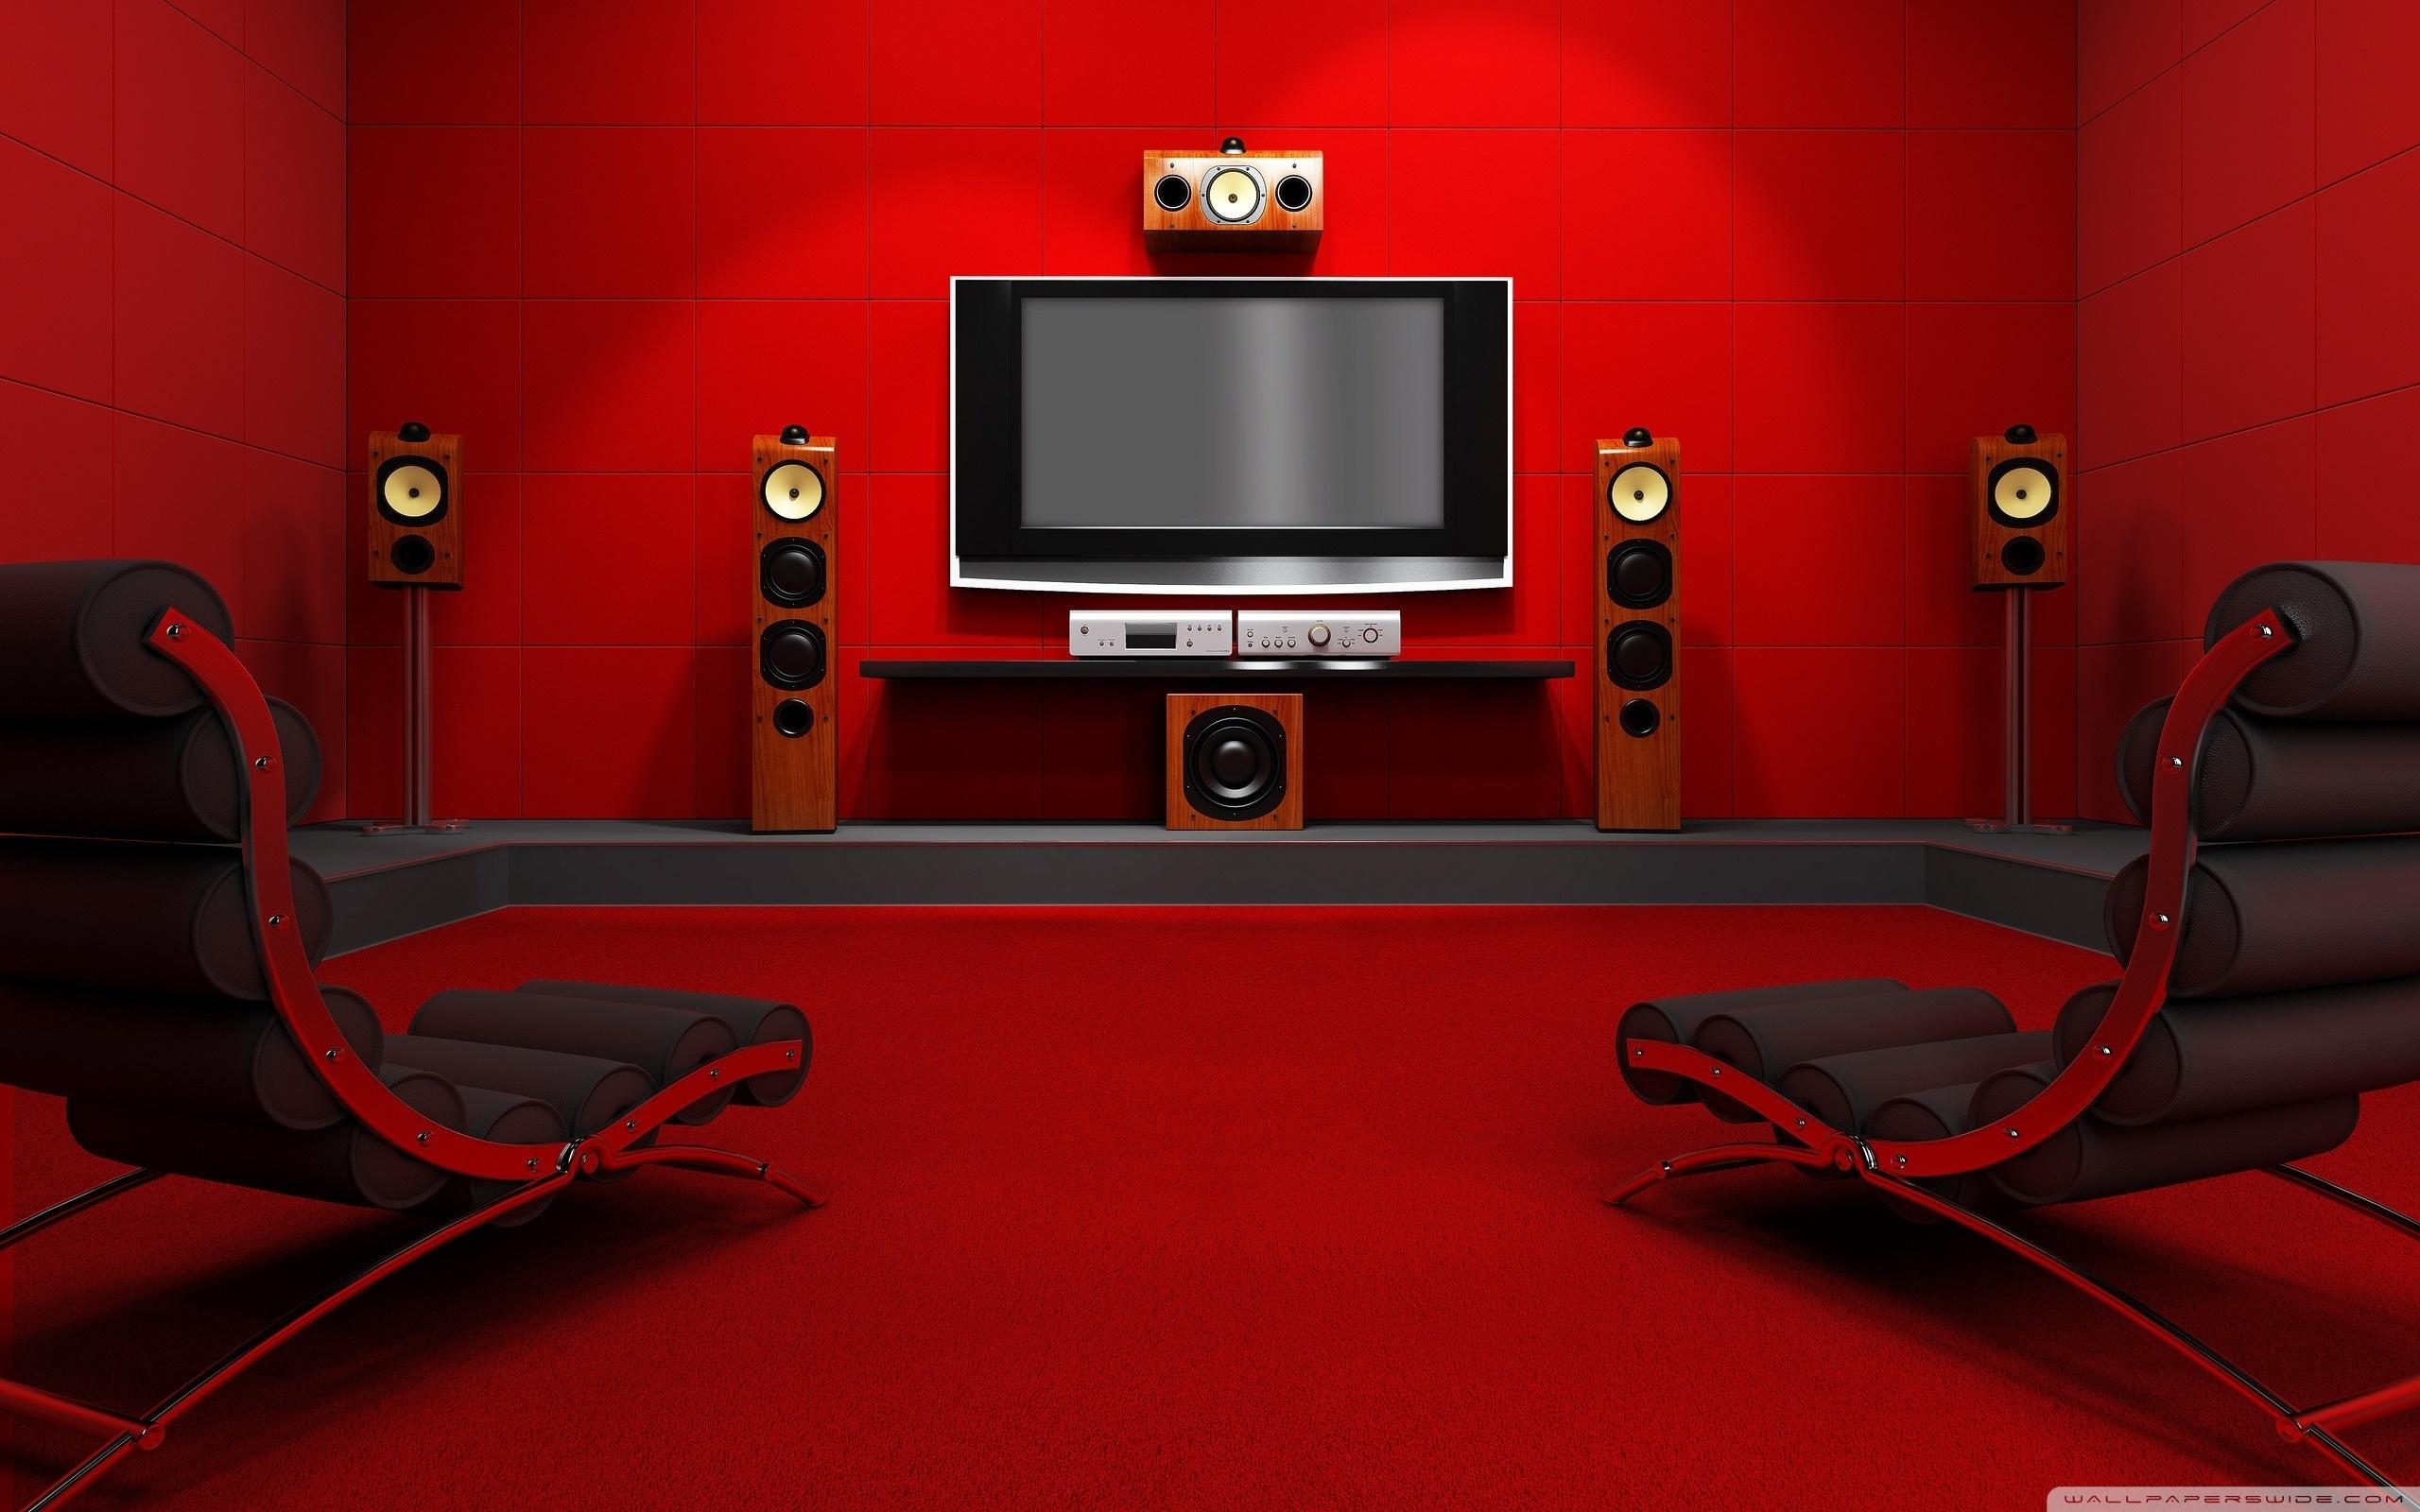 home media center ❤ 4k hd desktop wallpaper for 4k ultra hd tv